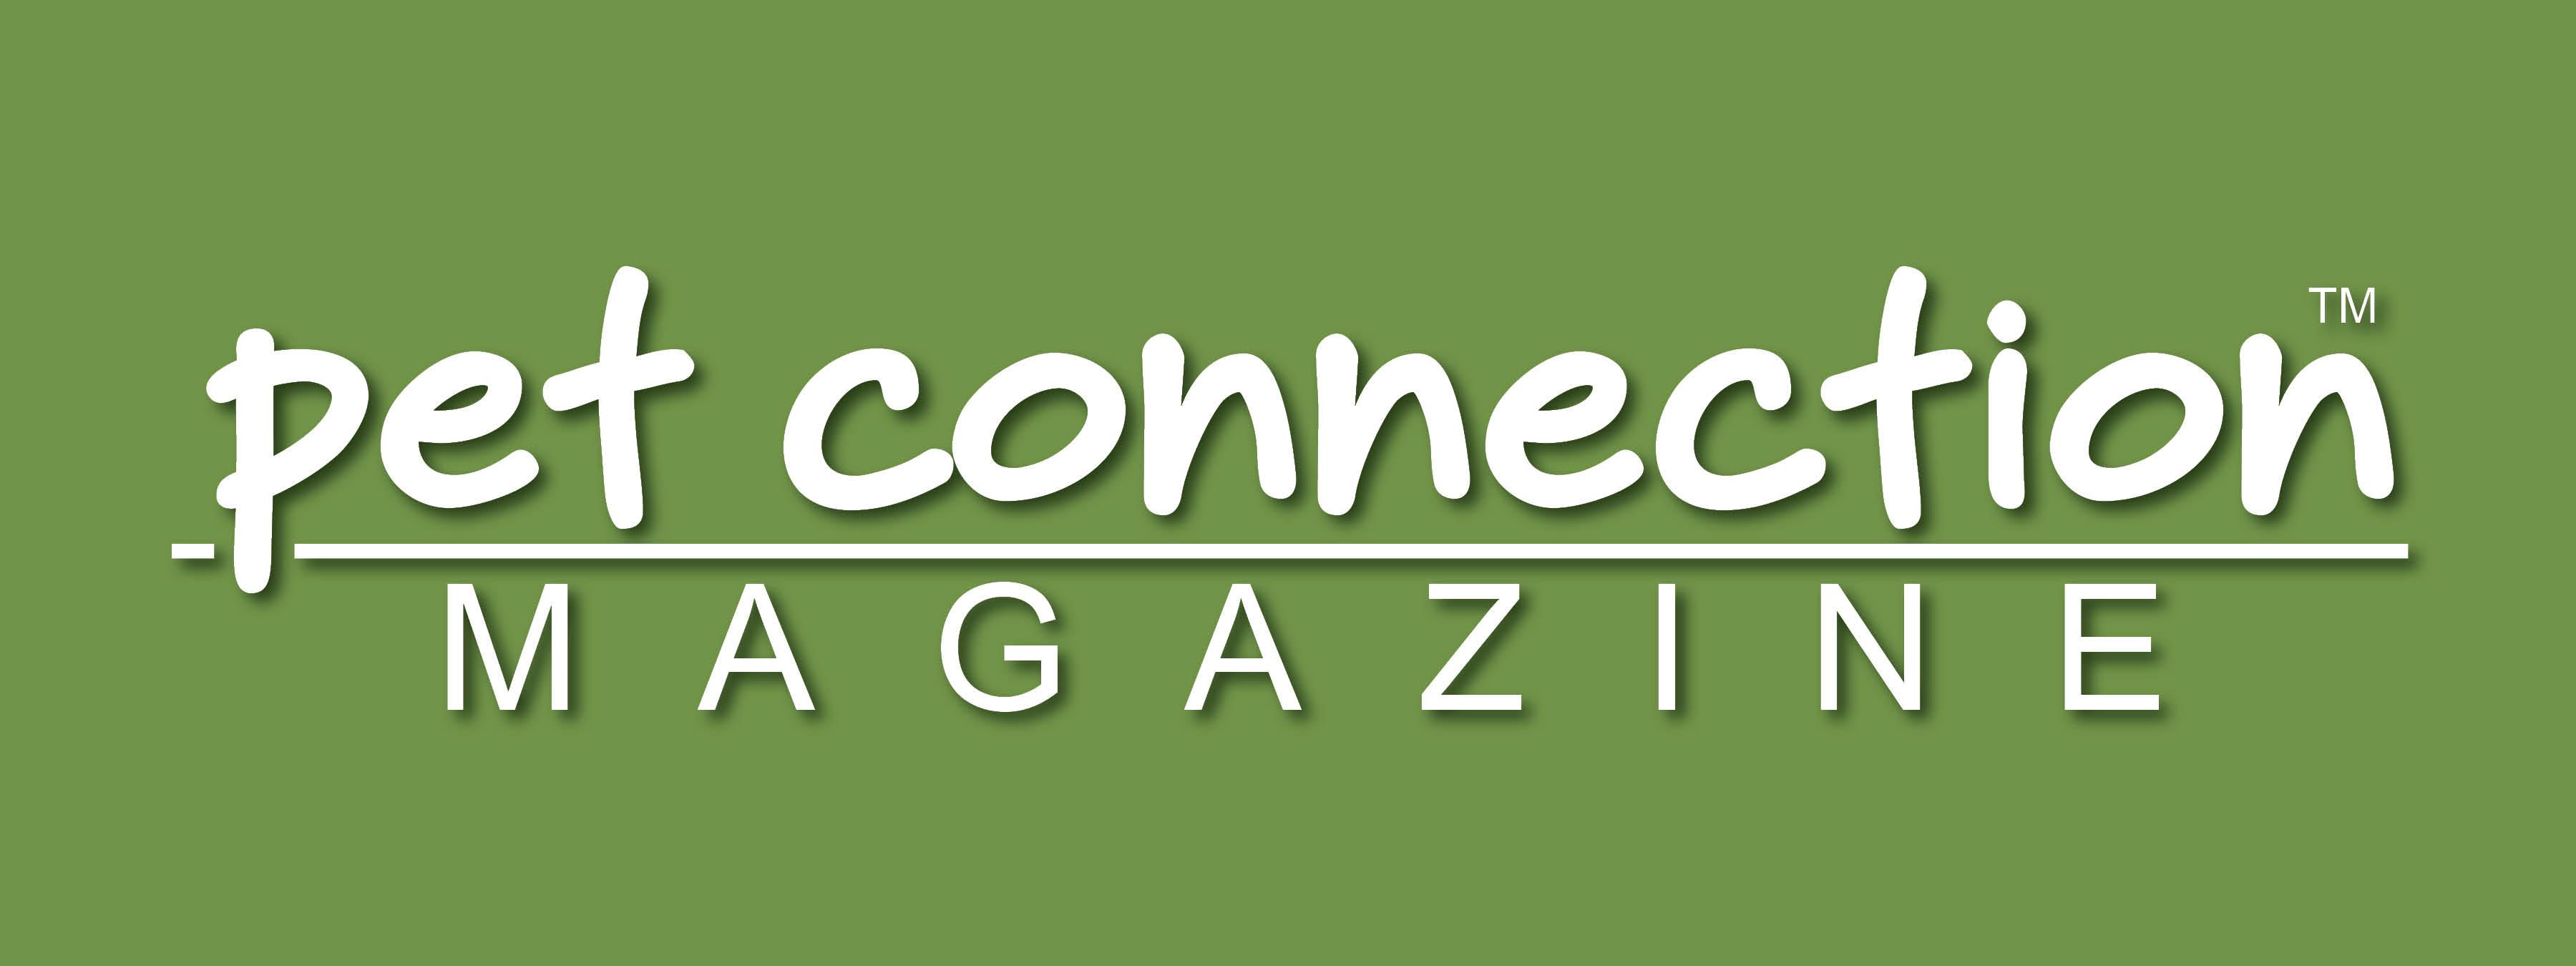 PCM logo 2018